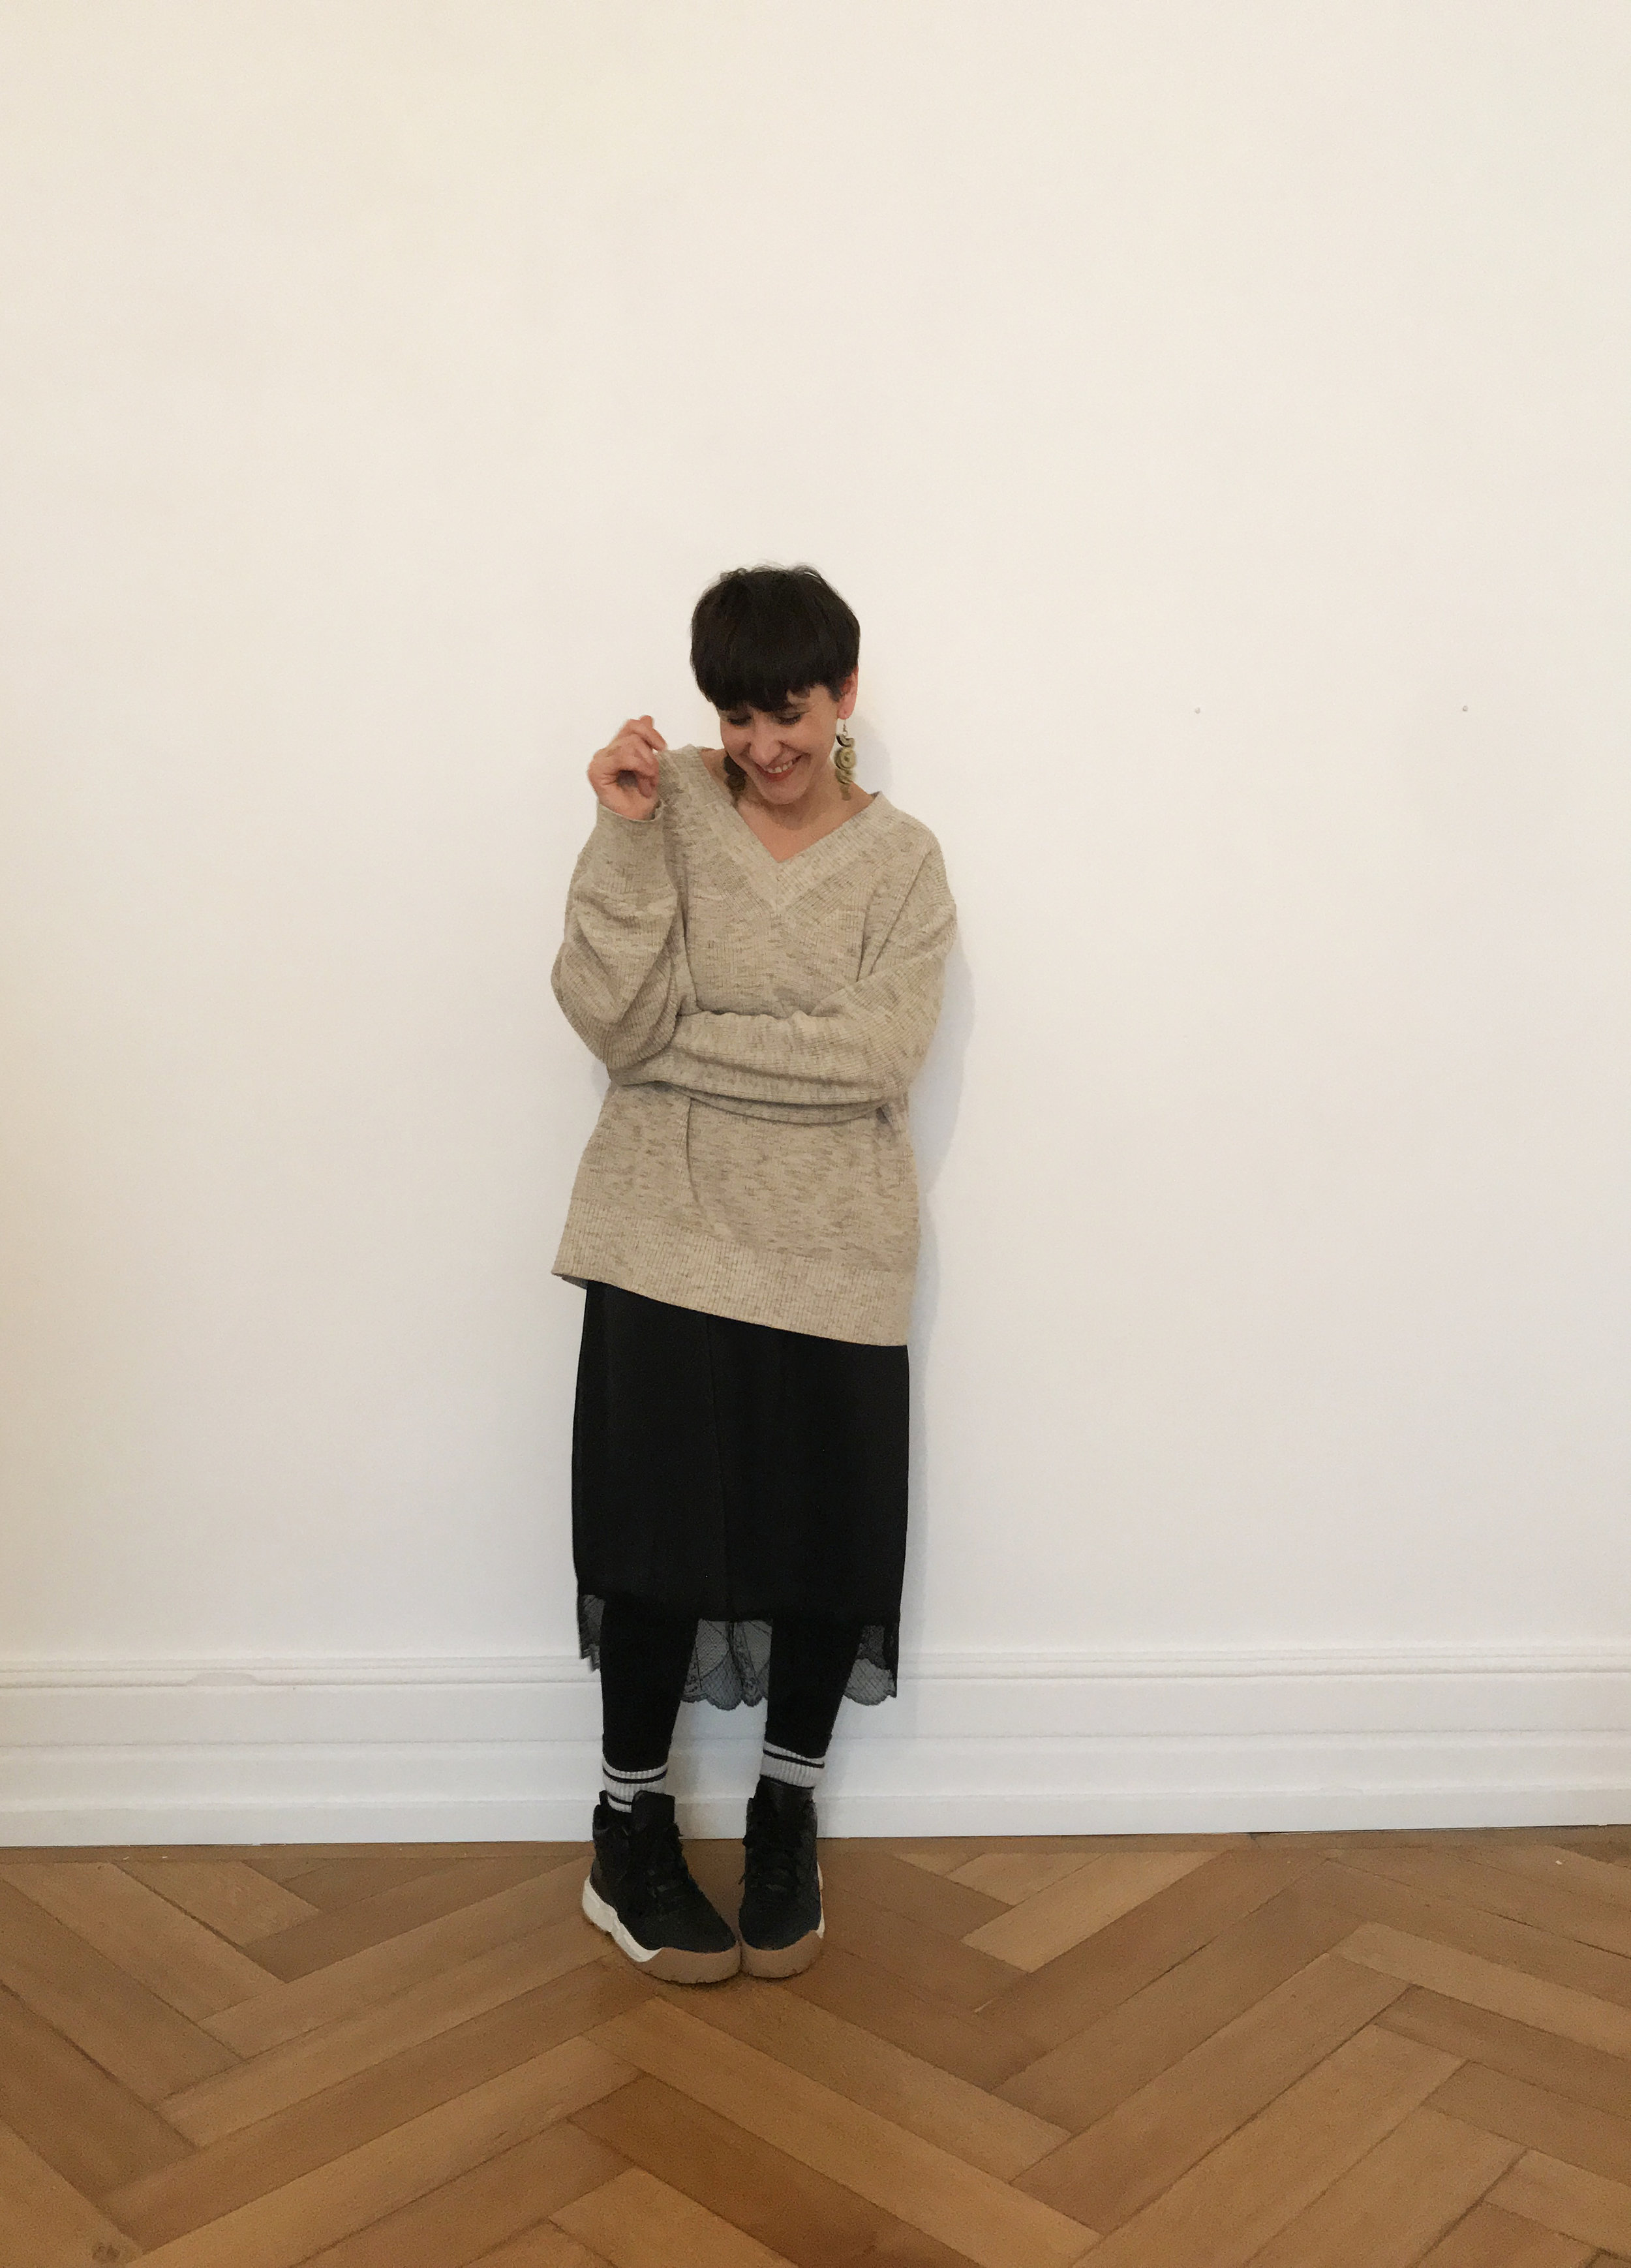 Casual - styled withCOS Jumper, Zara Trainers, Weekday socks, Rosita Bonita Earrings